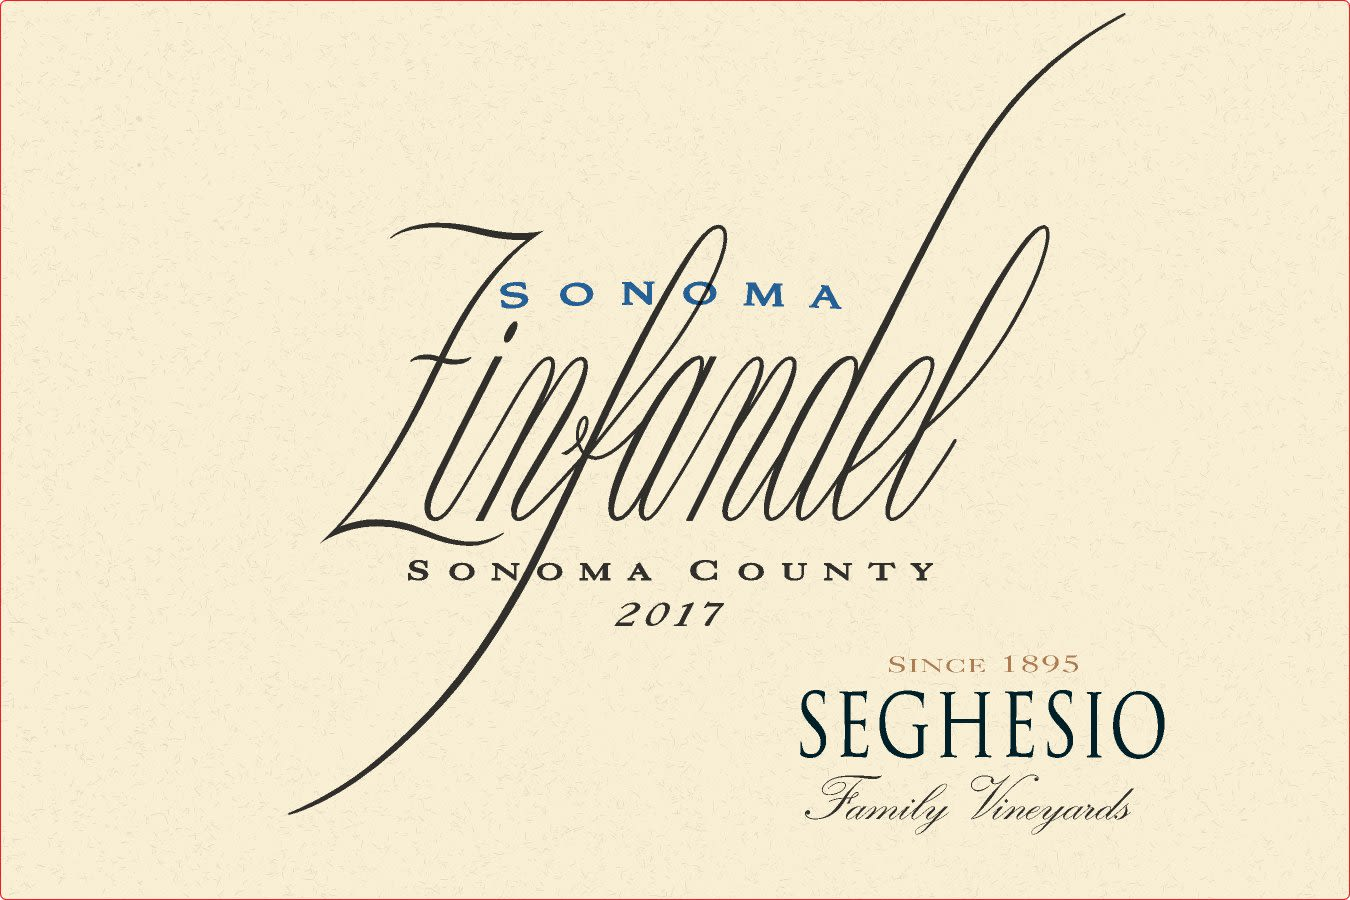 Seghesio Sonoma Zinfandel 2017